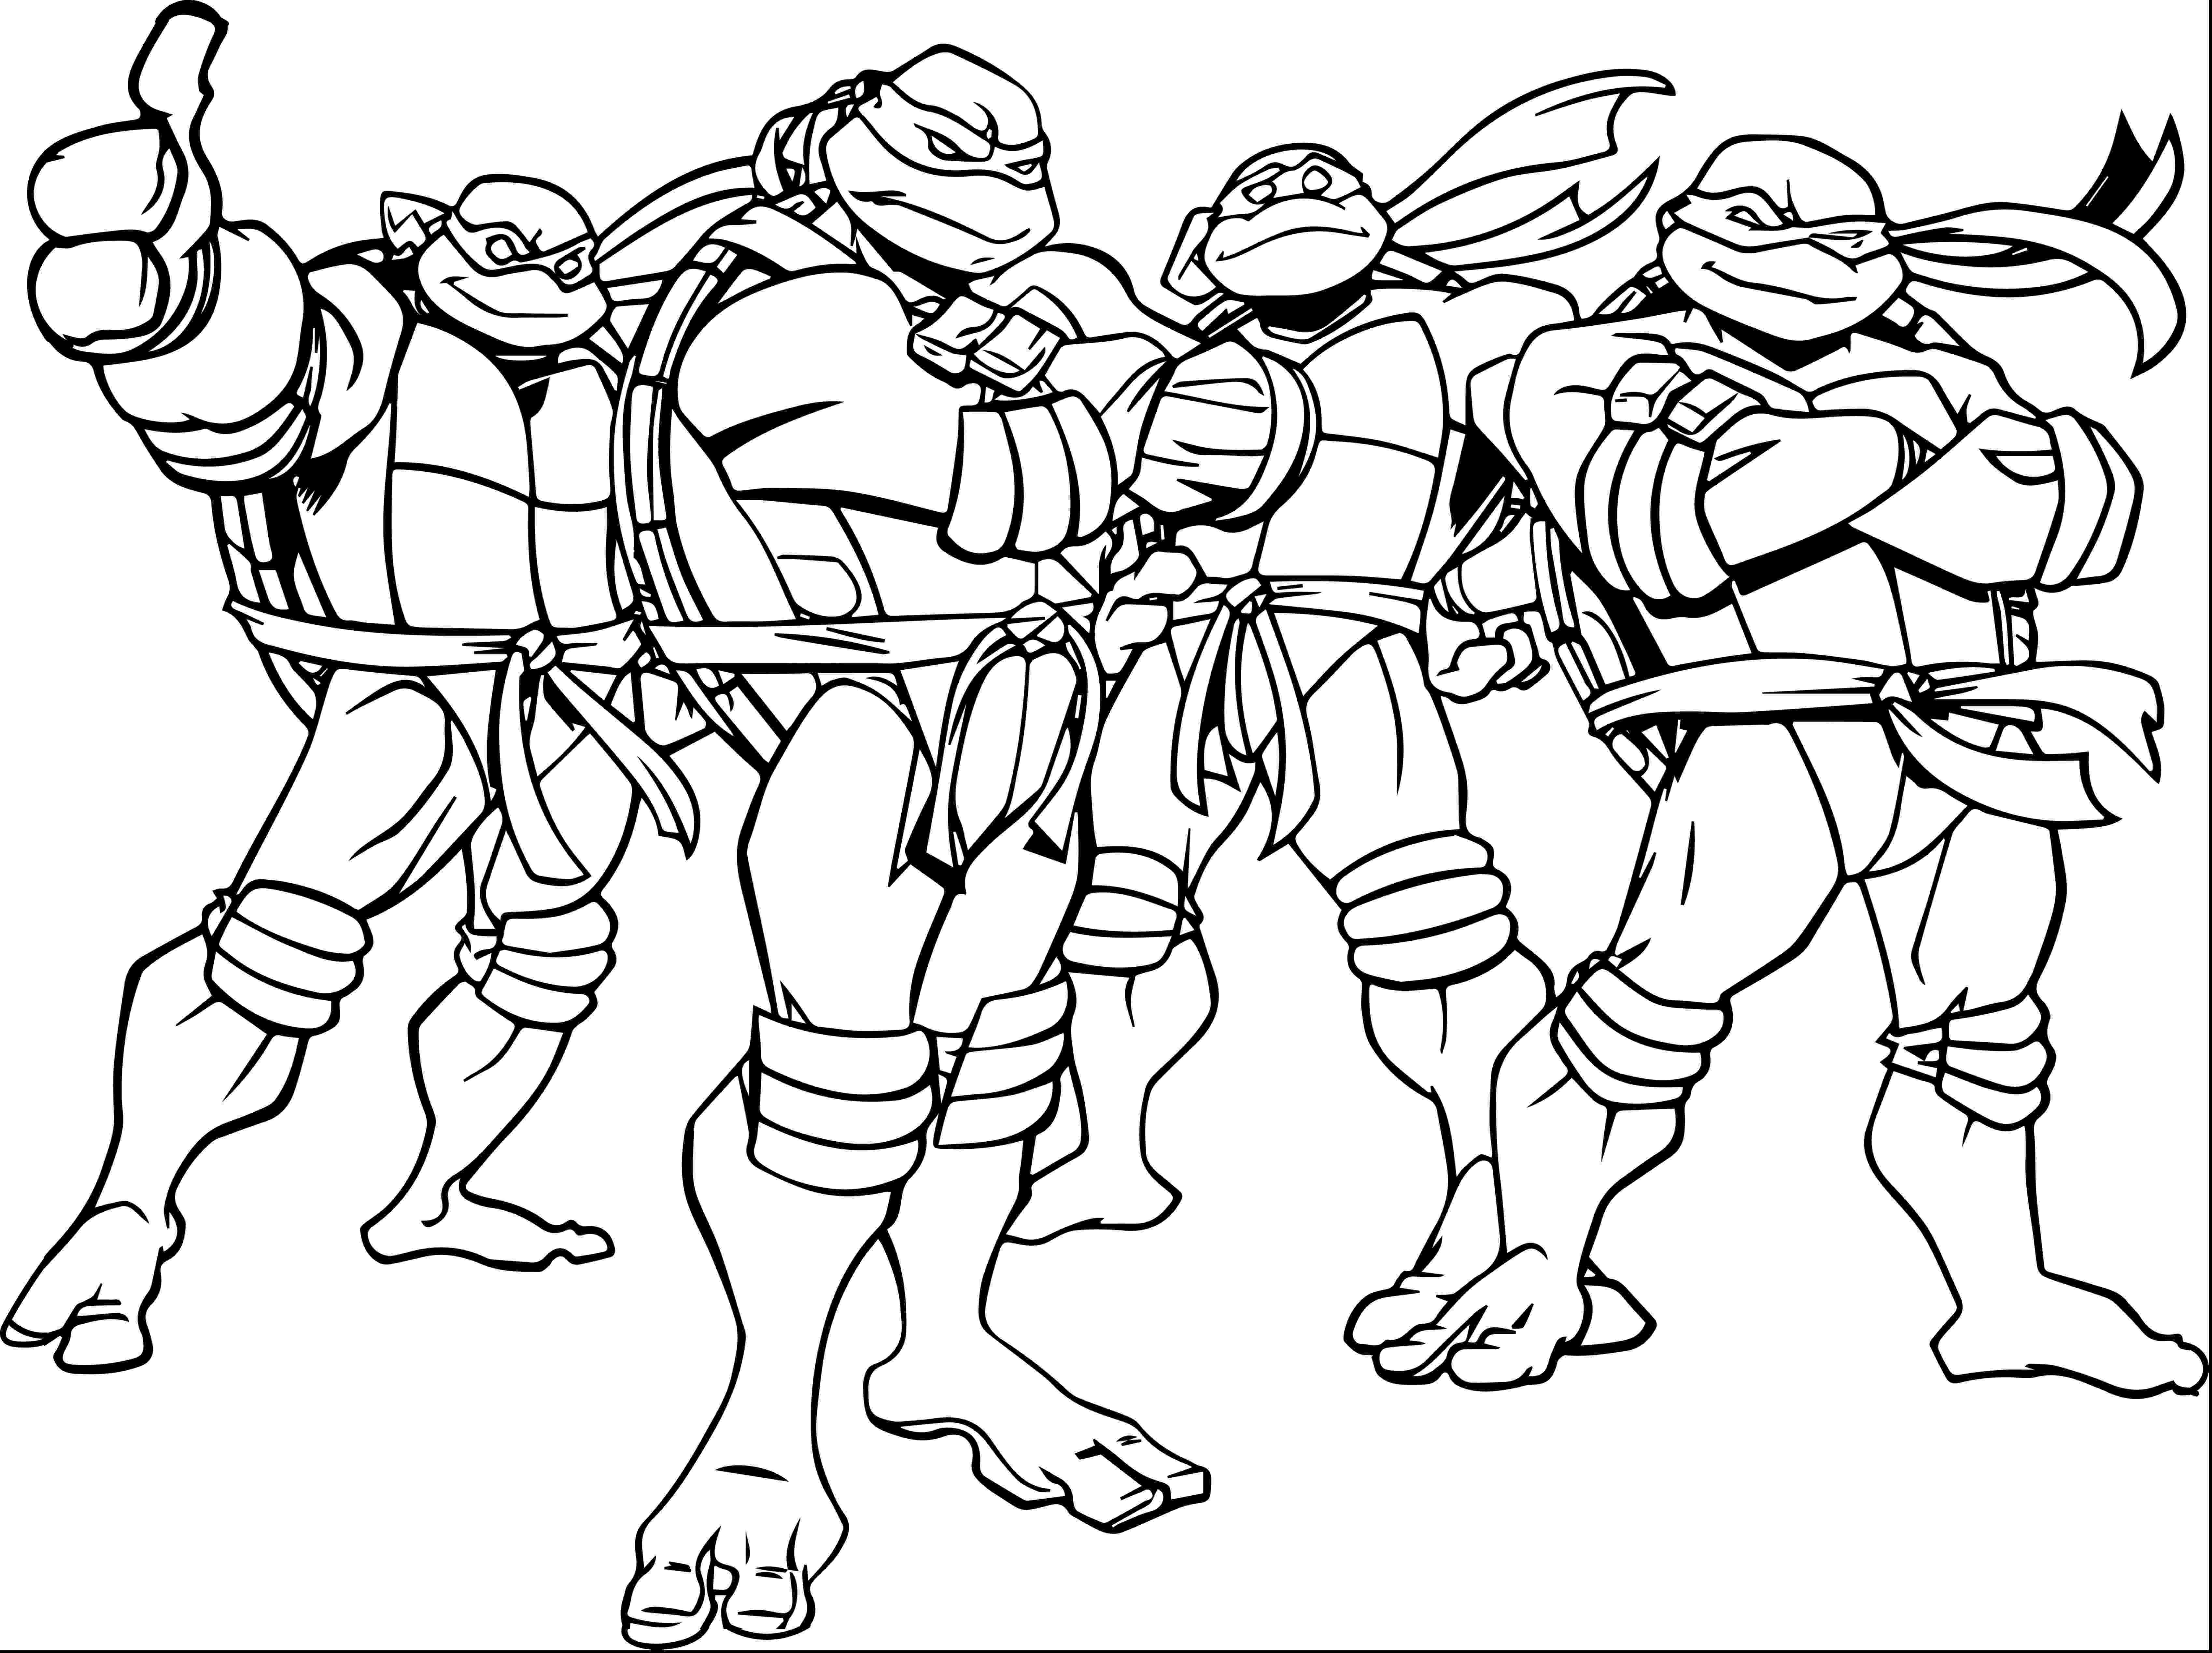 free printable coloring pages ninja turtles unusual idea tmnt coloring pages teenage mutant ninja ninja pages turtles printable free coloring